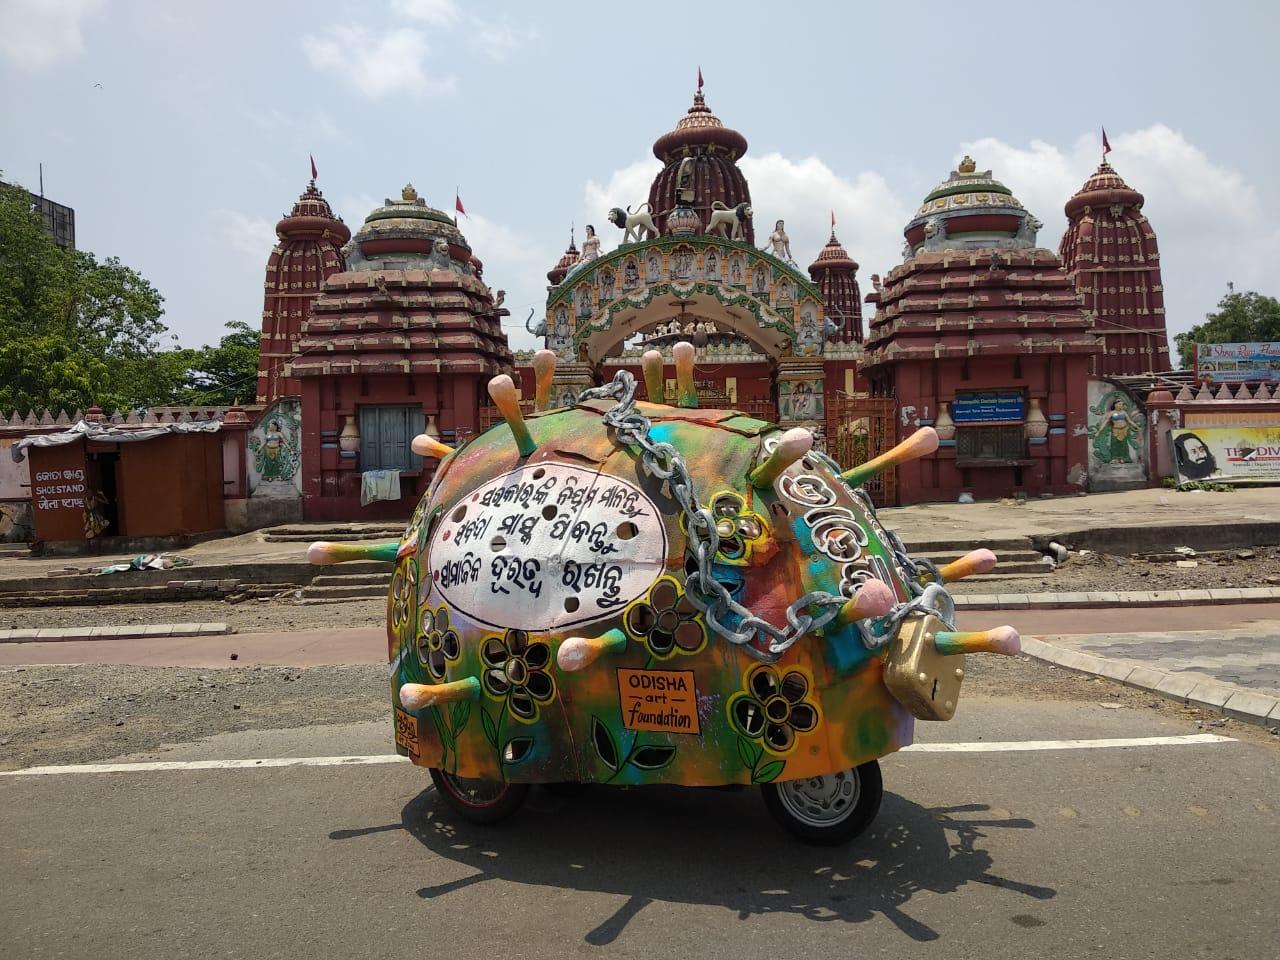 COVID-19 Second Wave: Sundargarh & Khurda Emerging Hotspots In Odisha